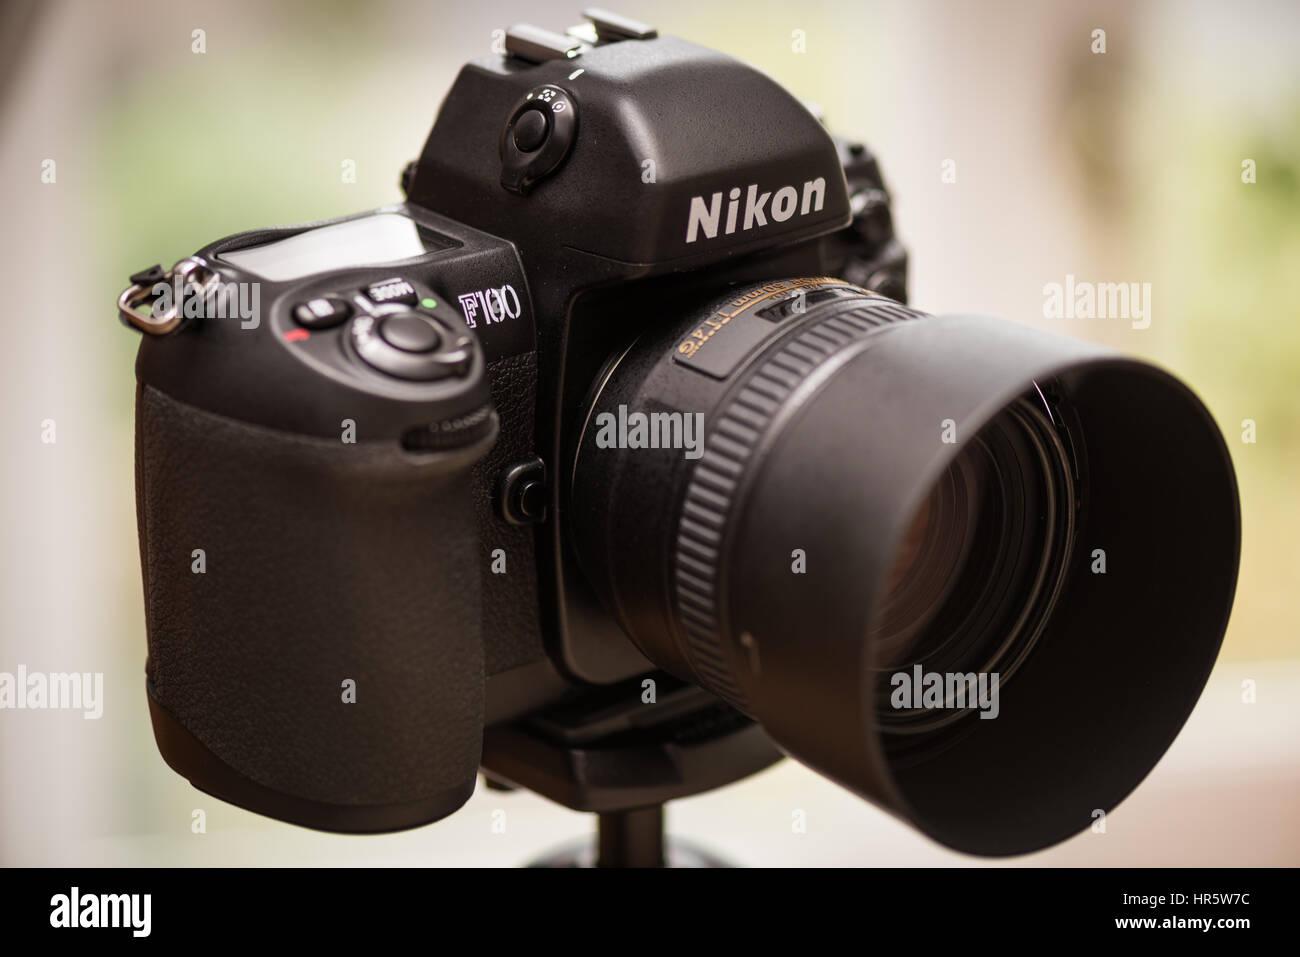 Nikon F100 35mm SLR film camera, with Nikon 50mm f1.4G lens attached. - Stock Image